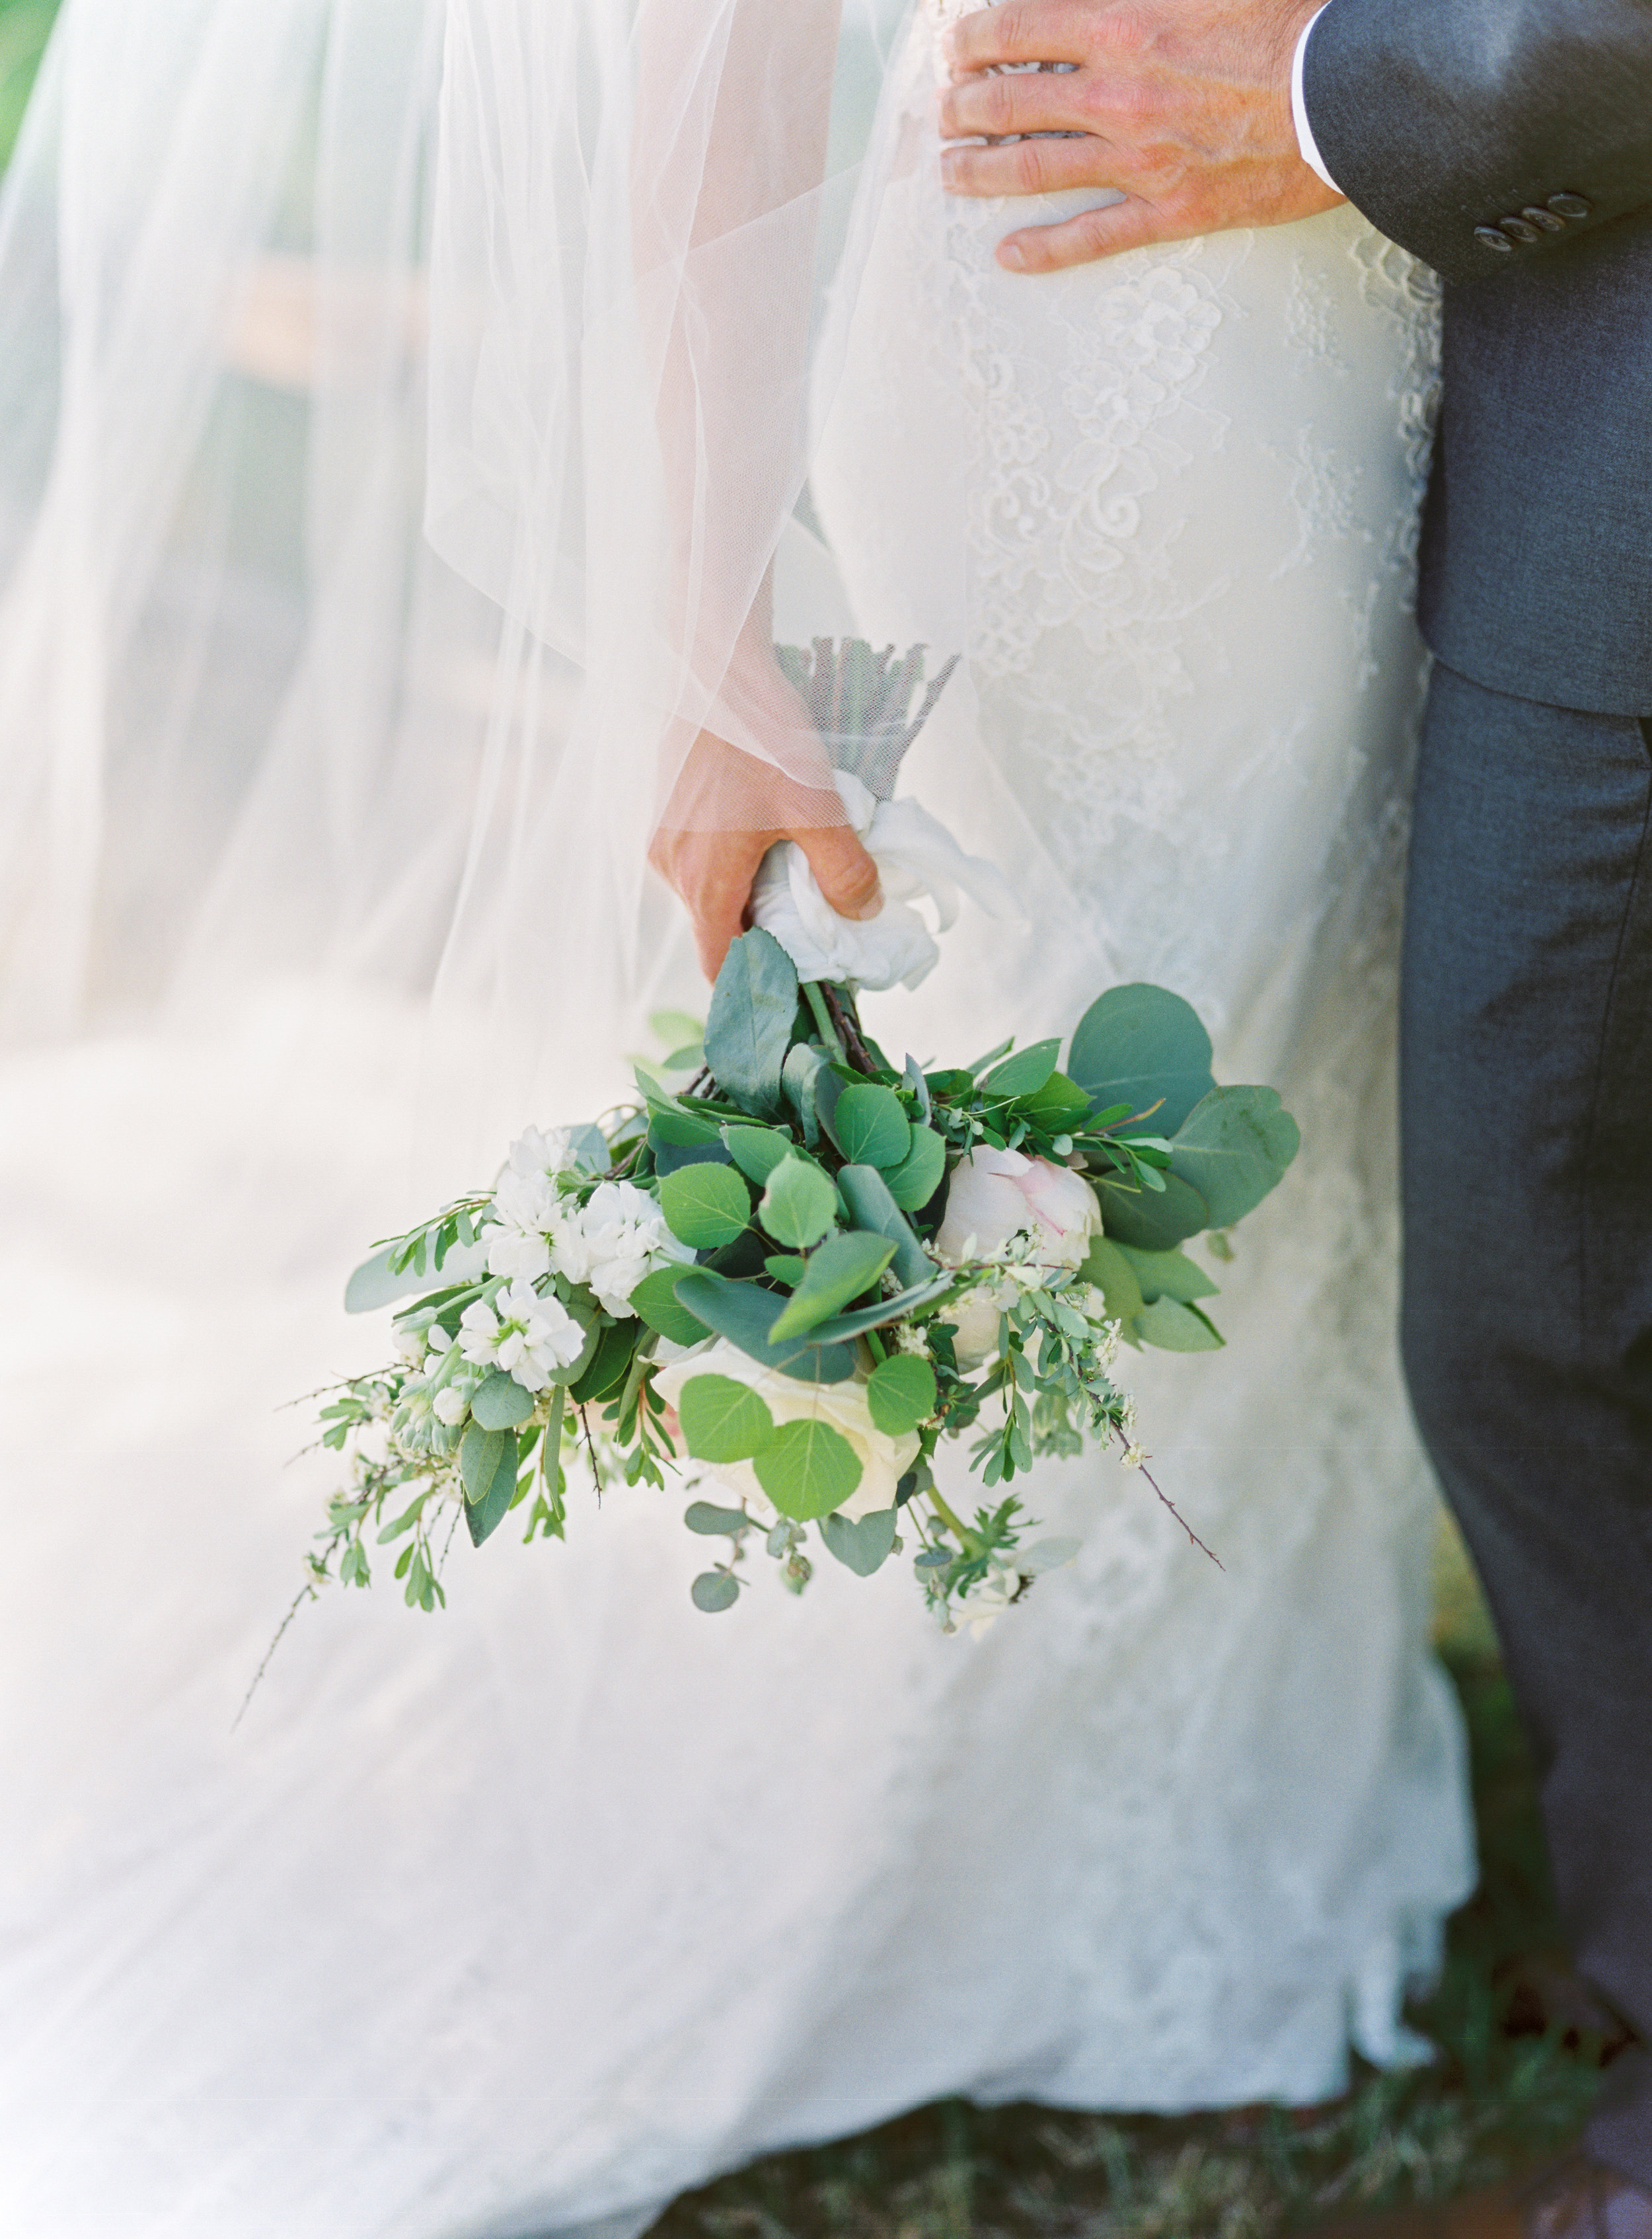 Kathryn-Allen-Boulder-wedding-2018-by-Lisa-ODwyer-111.jpg